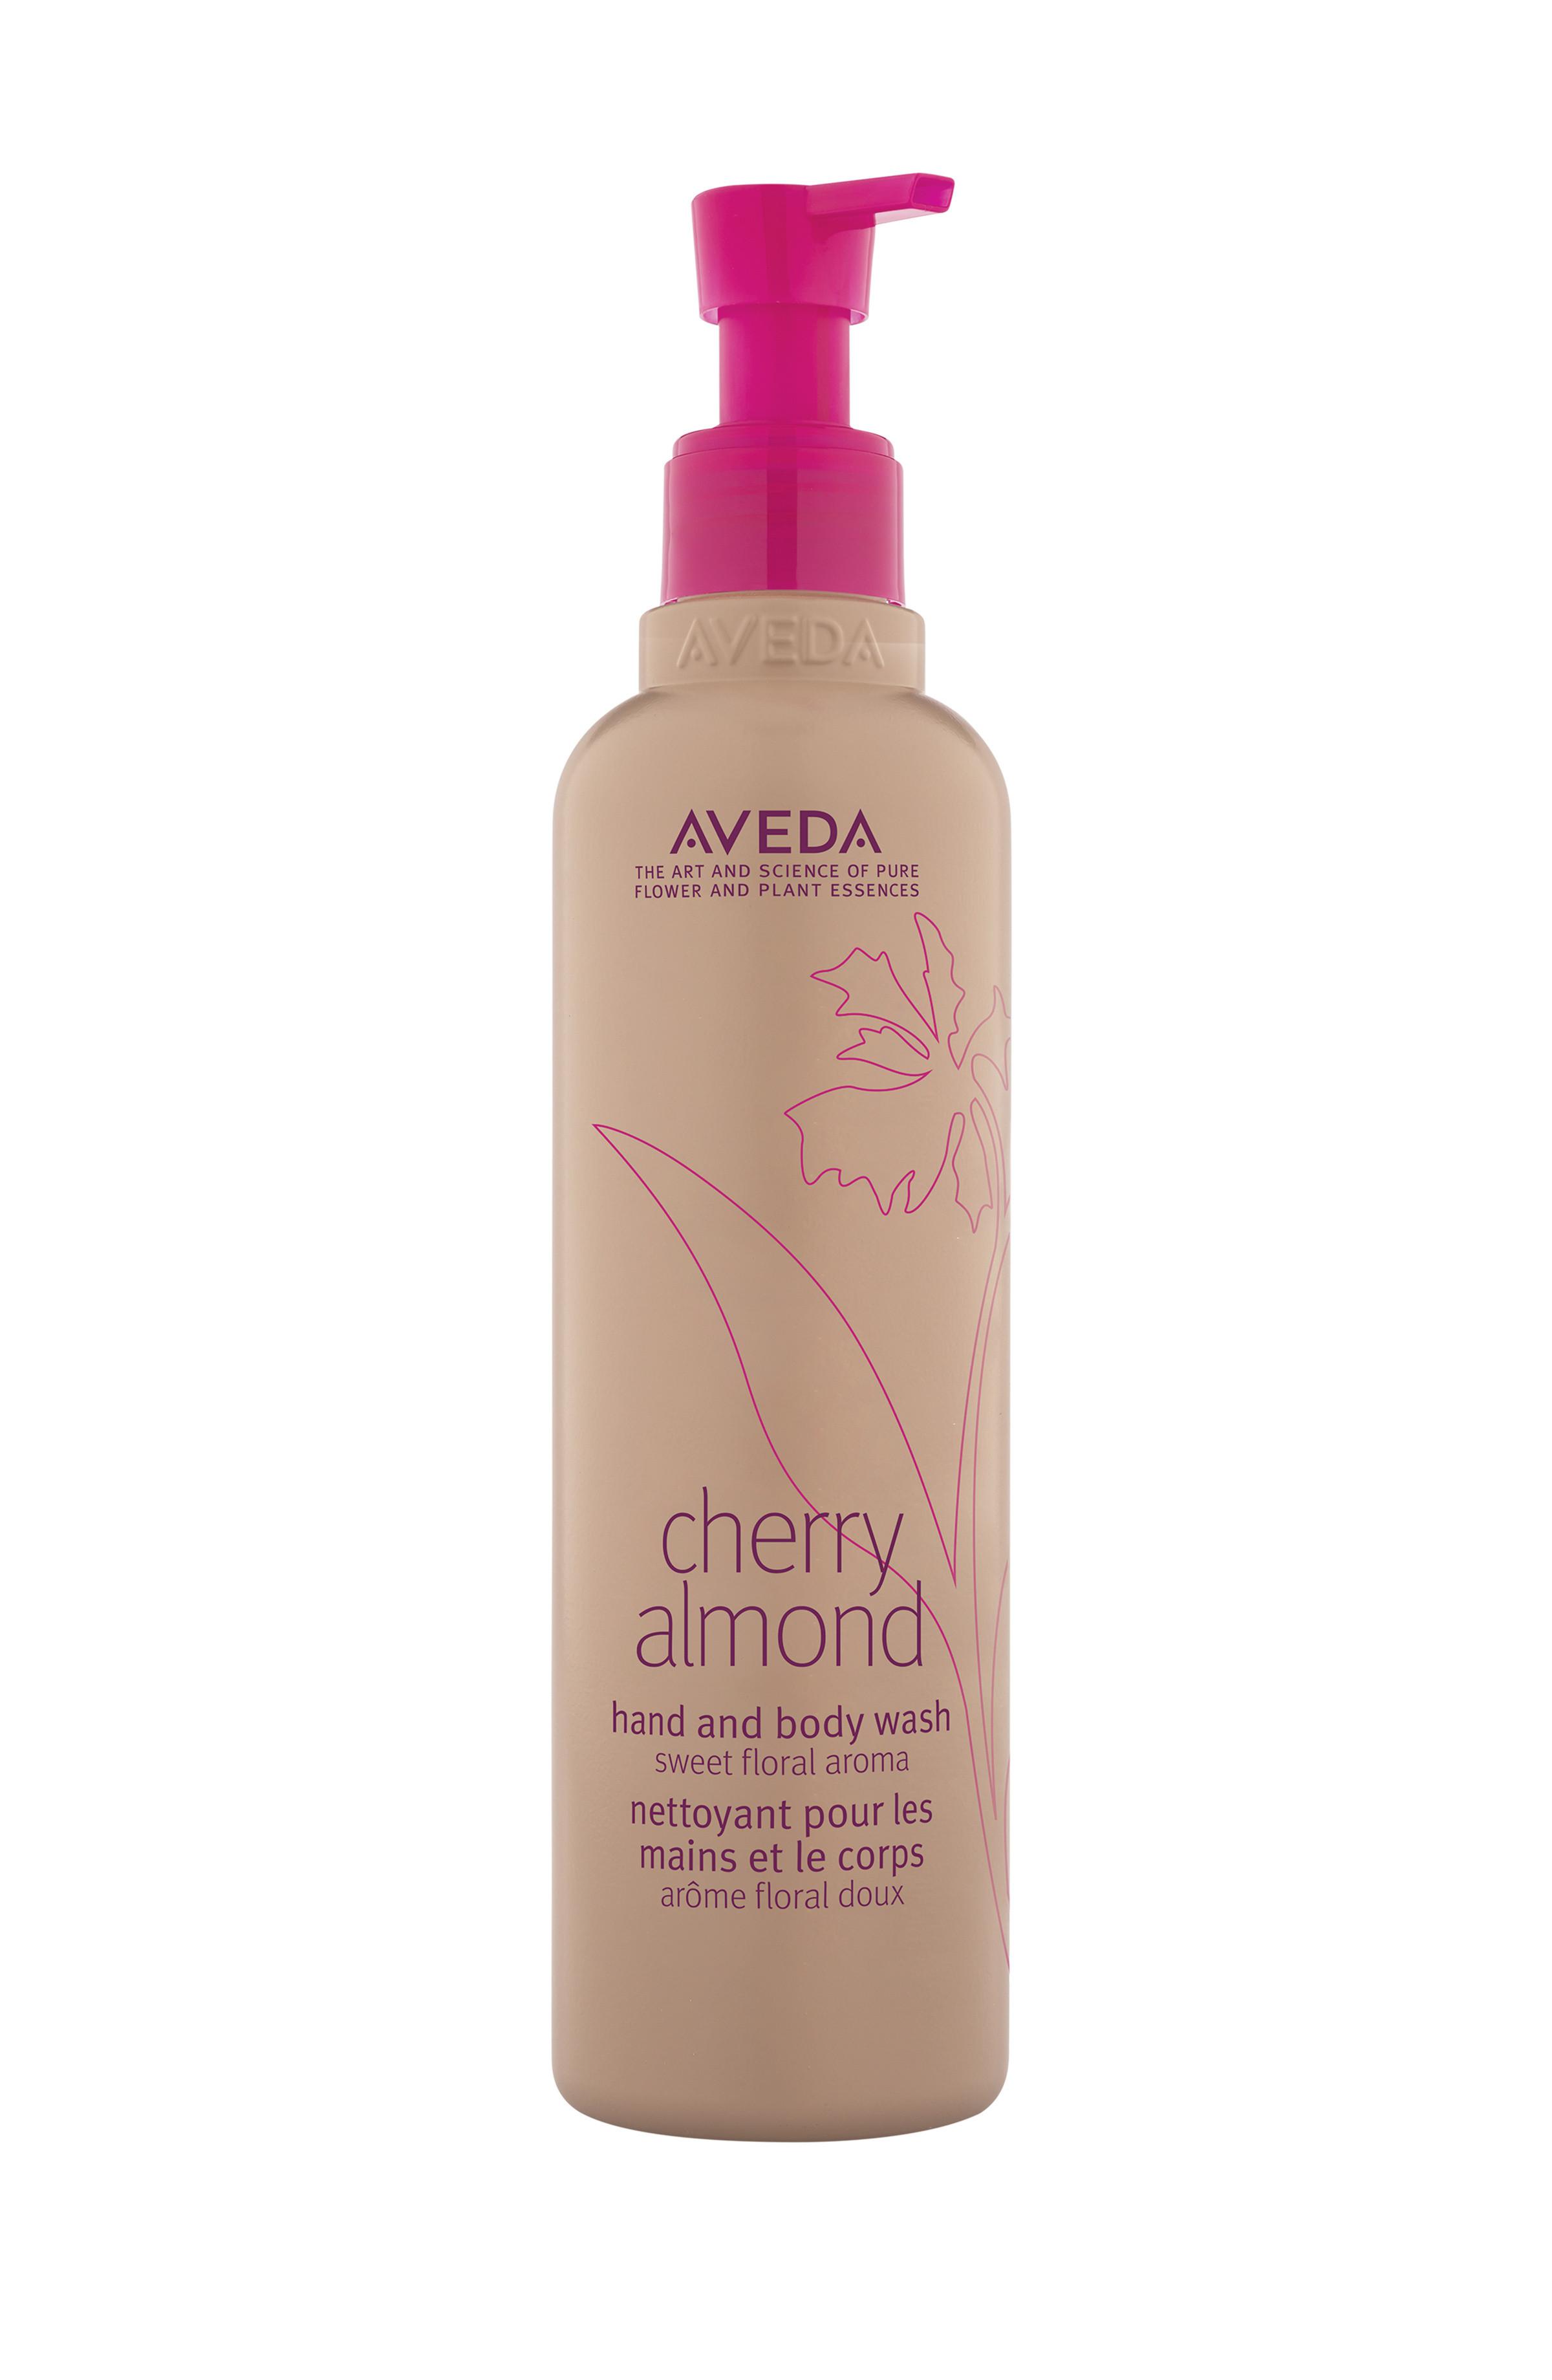 Aveda cherry almond docciashiuma corpo e mani 250 ml, Beige, large image number 0